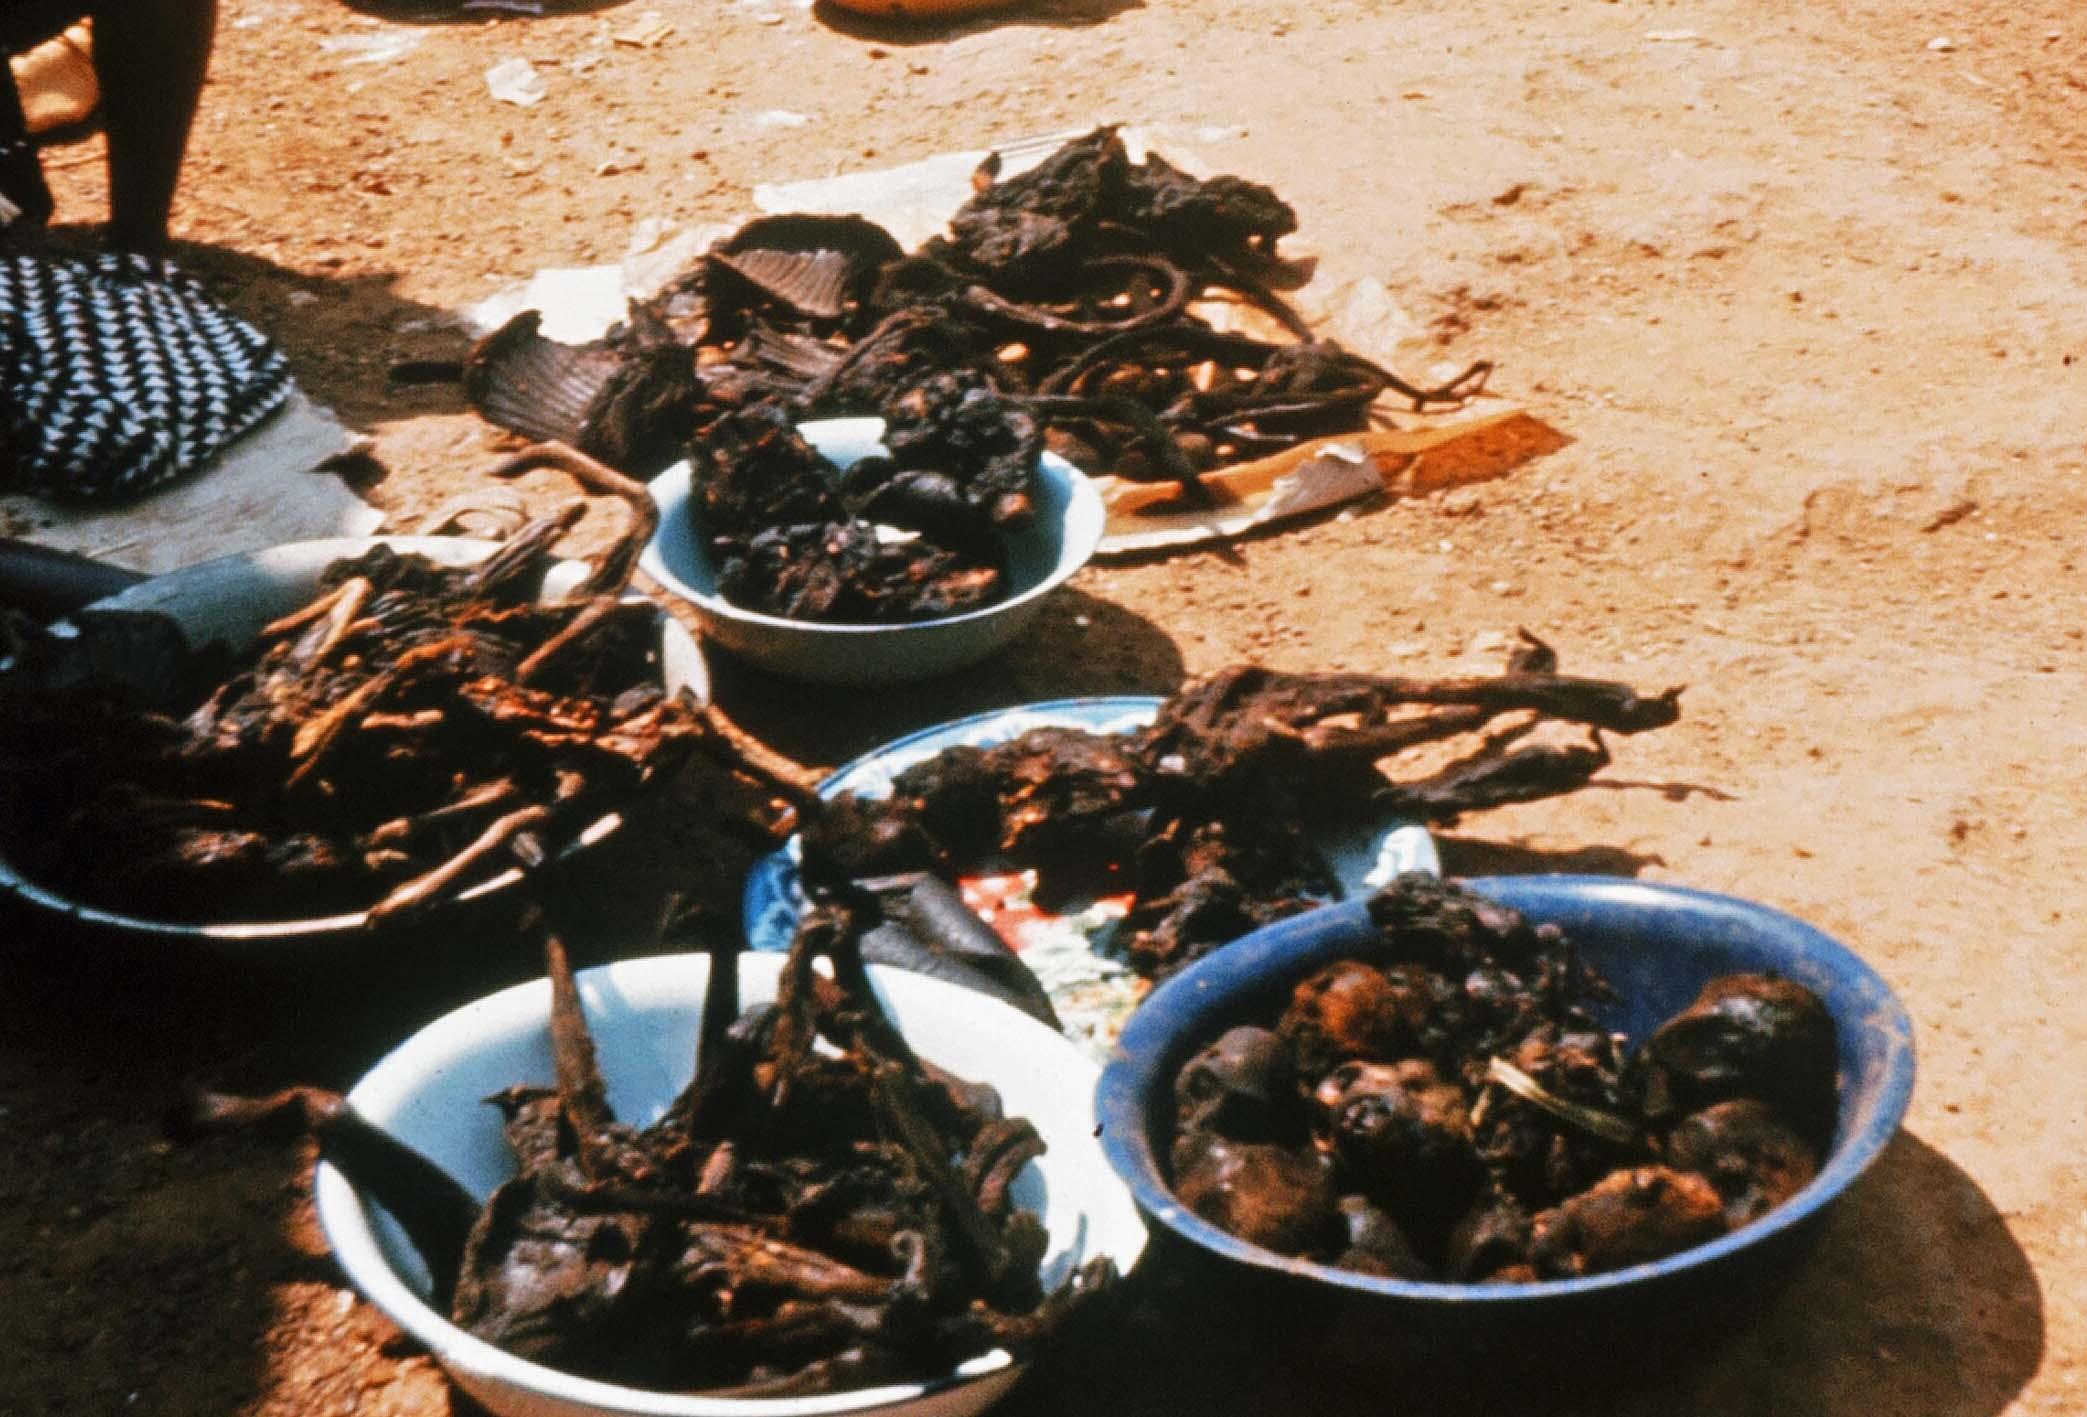 Ready to eat monkey meat in Ganta, Liberia.